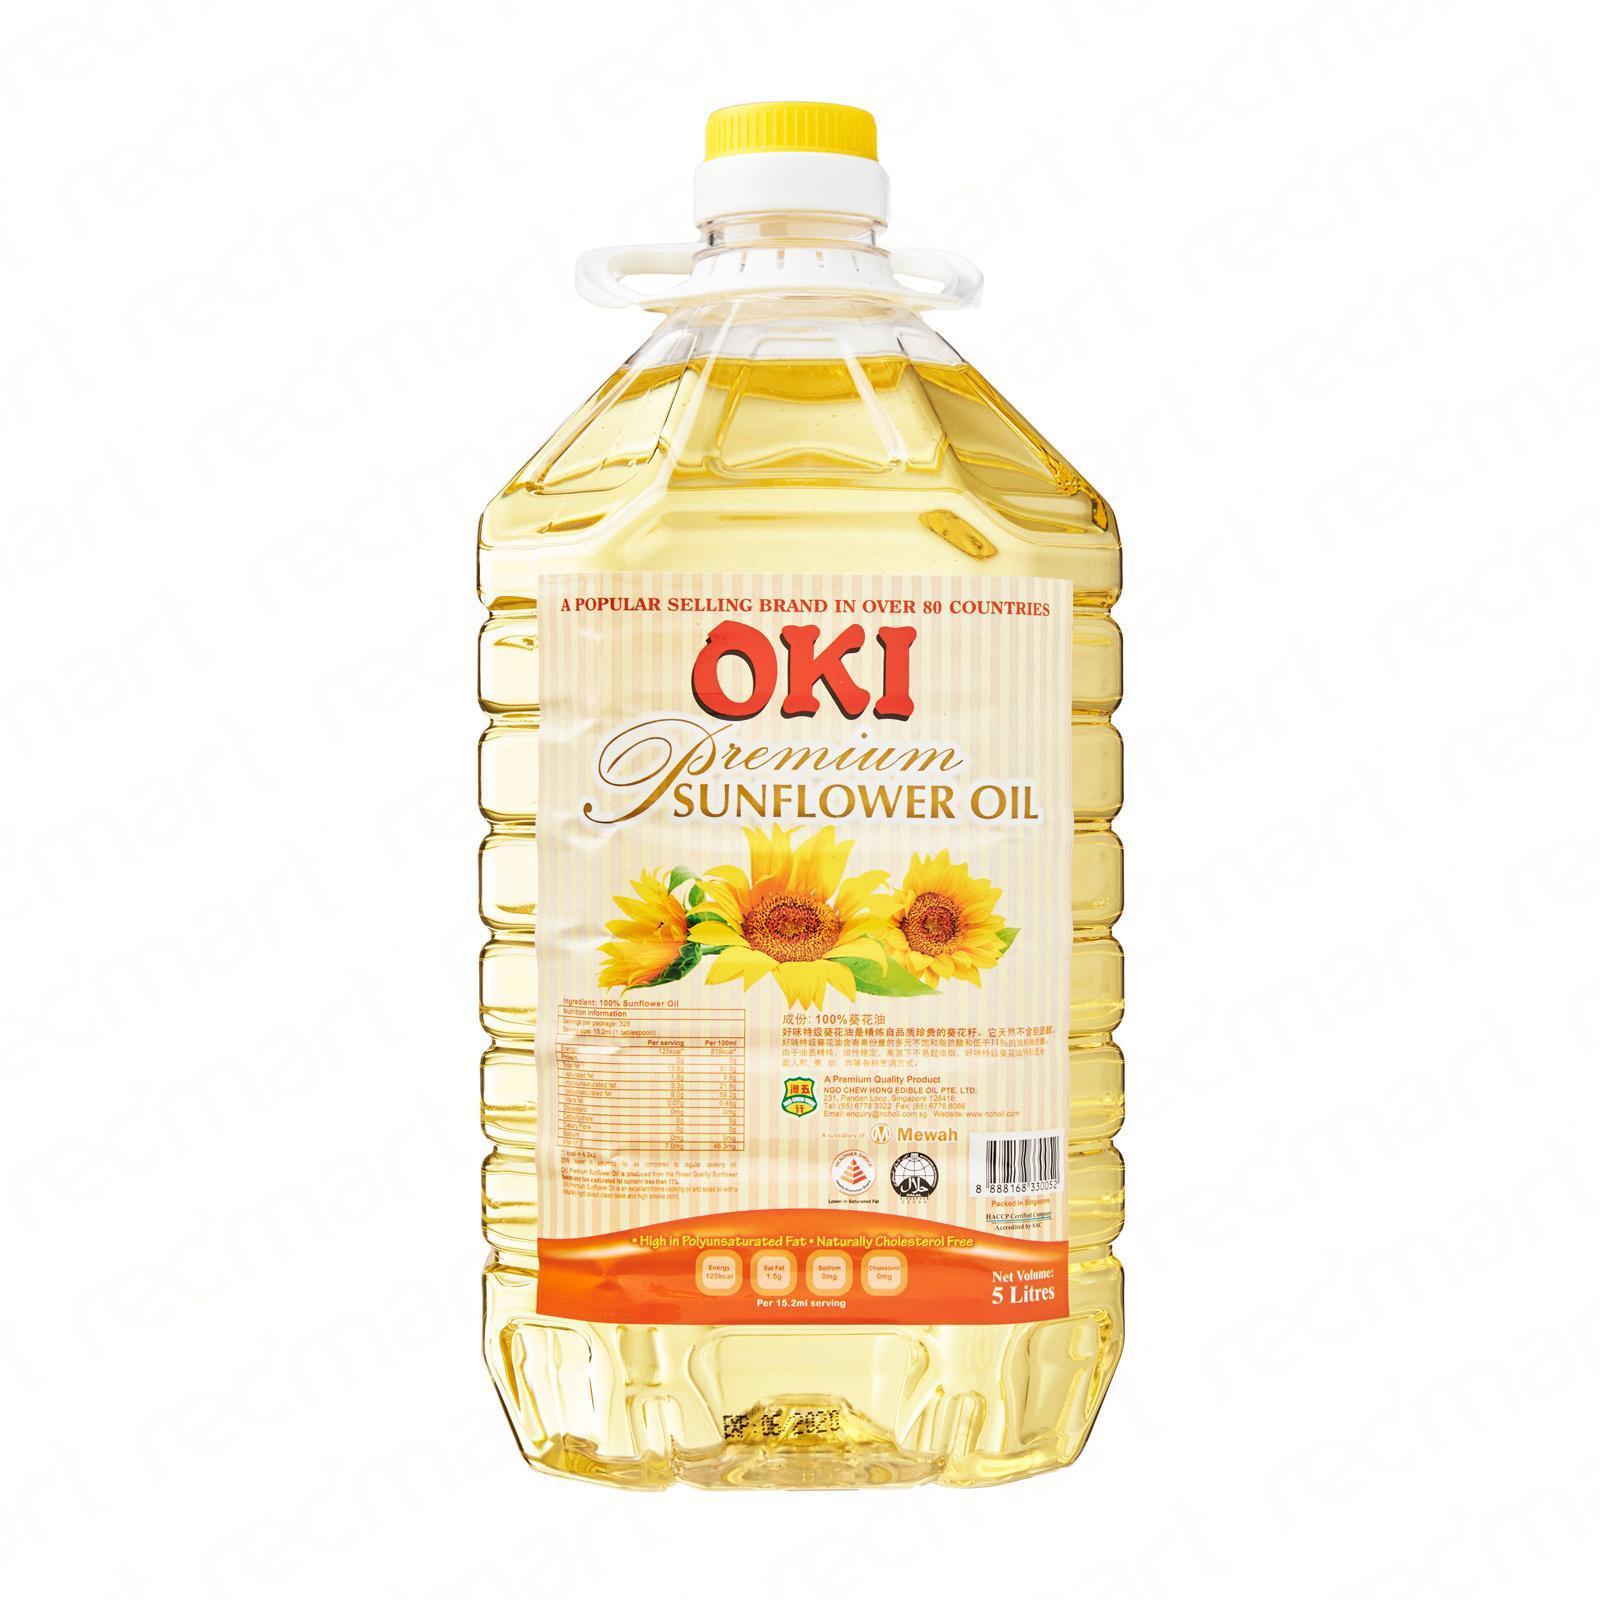 OKI Premium Sunflower Oil 5L